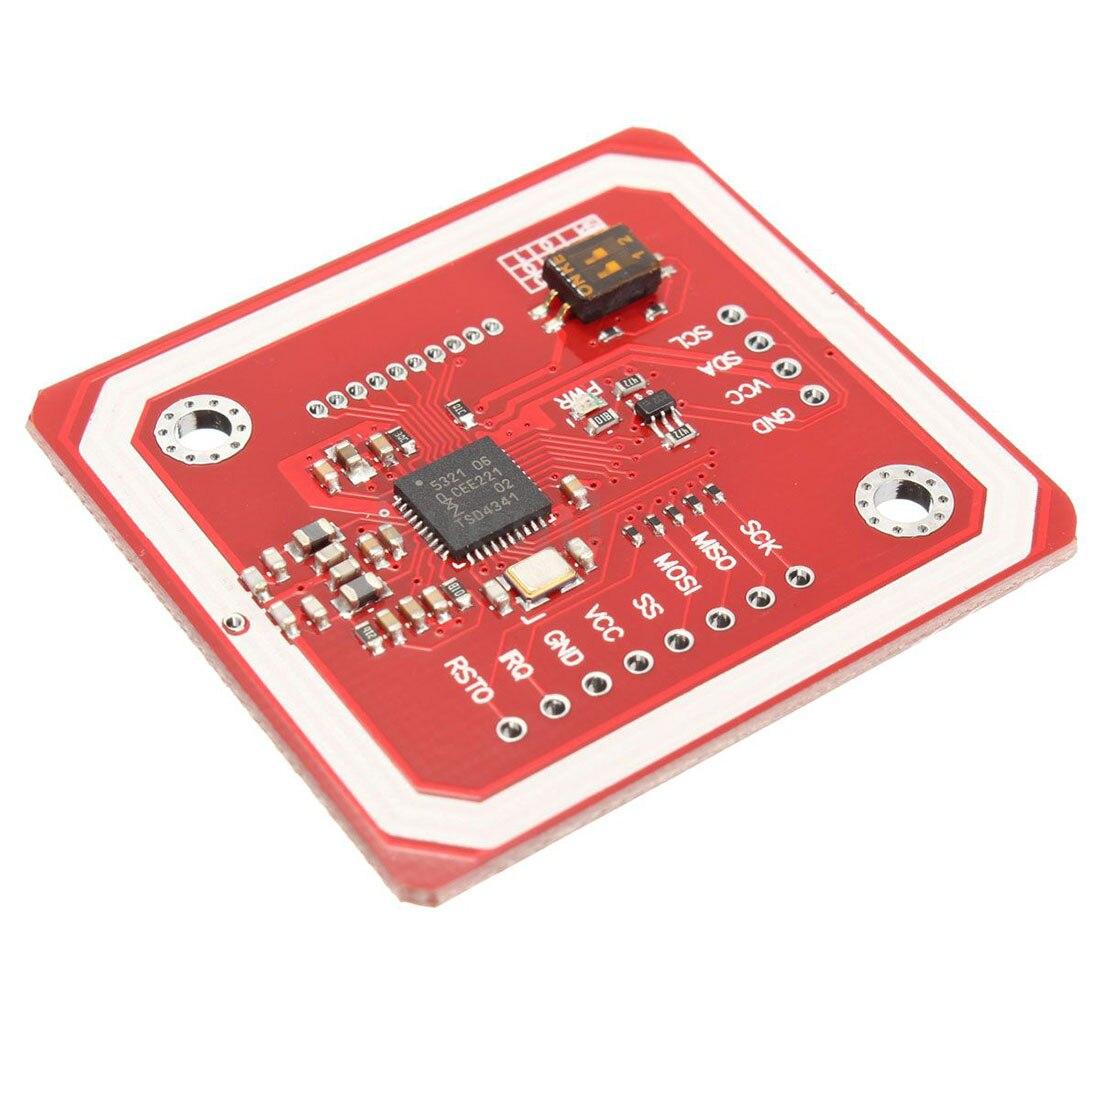 купить MOOL PN532 NFC RFID V3 Module Kits for Arduino Android по цене 476.64 рублей